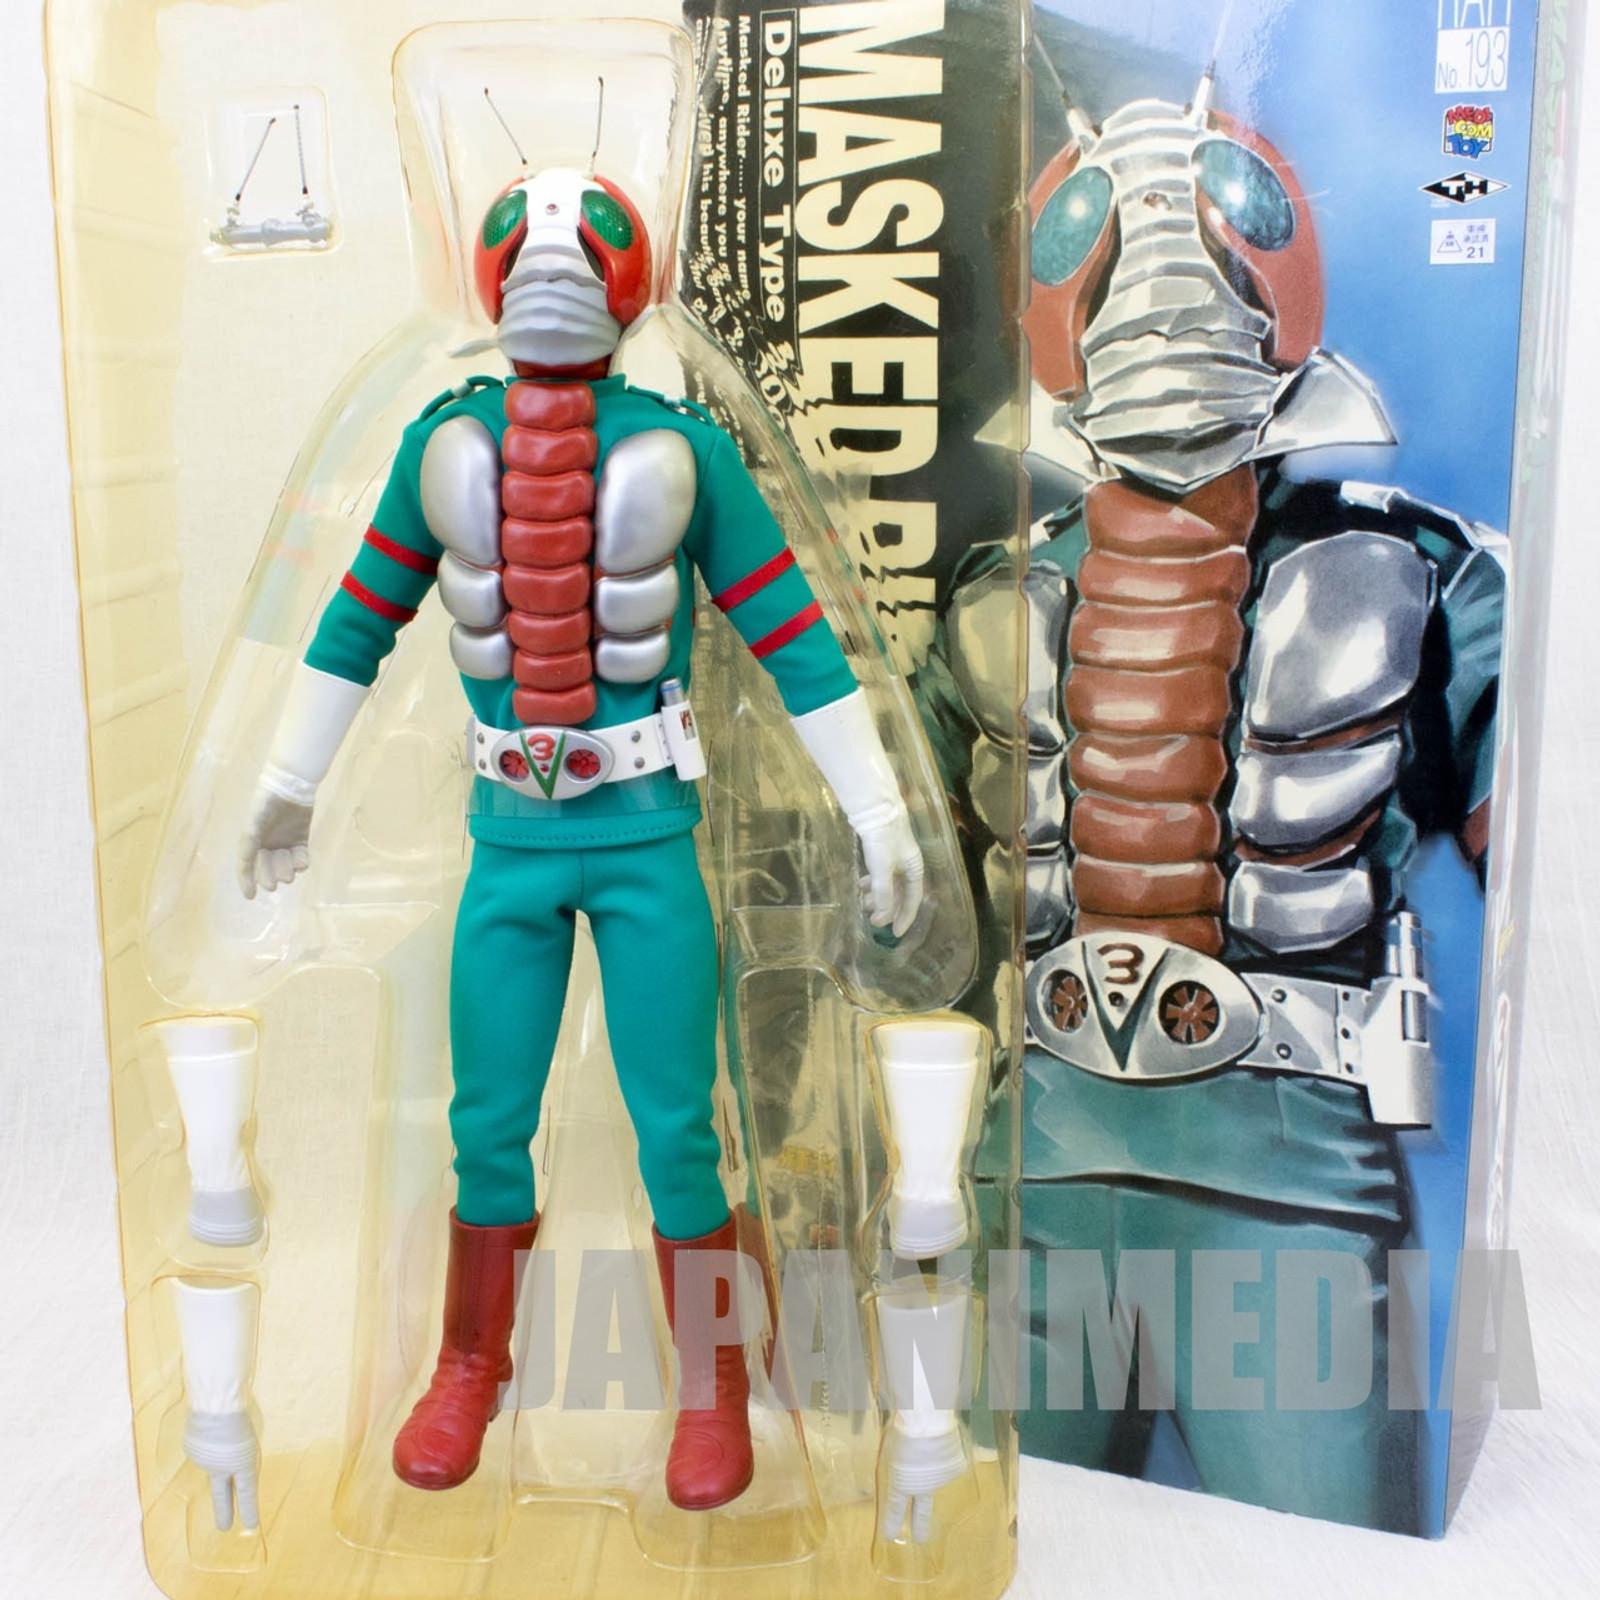 Kamen Rider V3 Real Action Heroes Deluxe Type 2004 Figure Medicom Toy